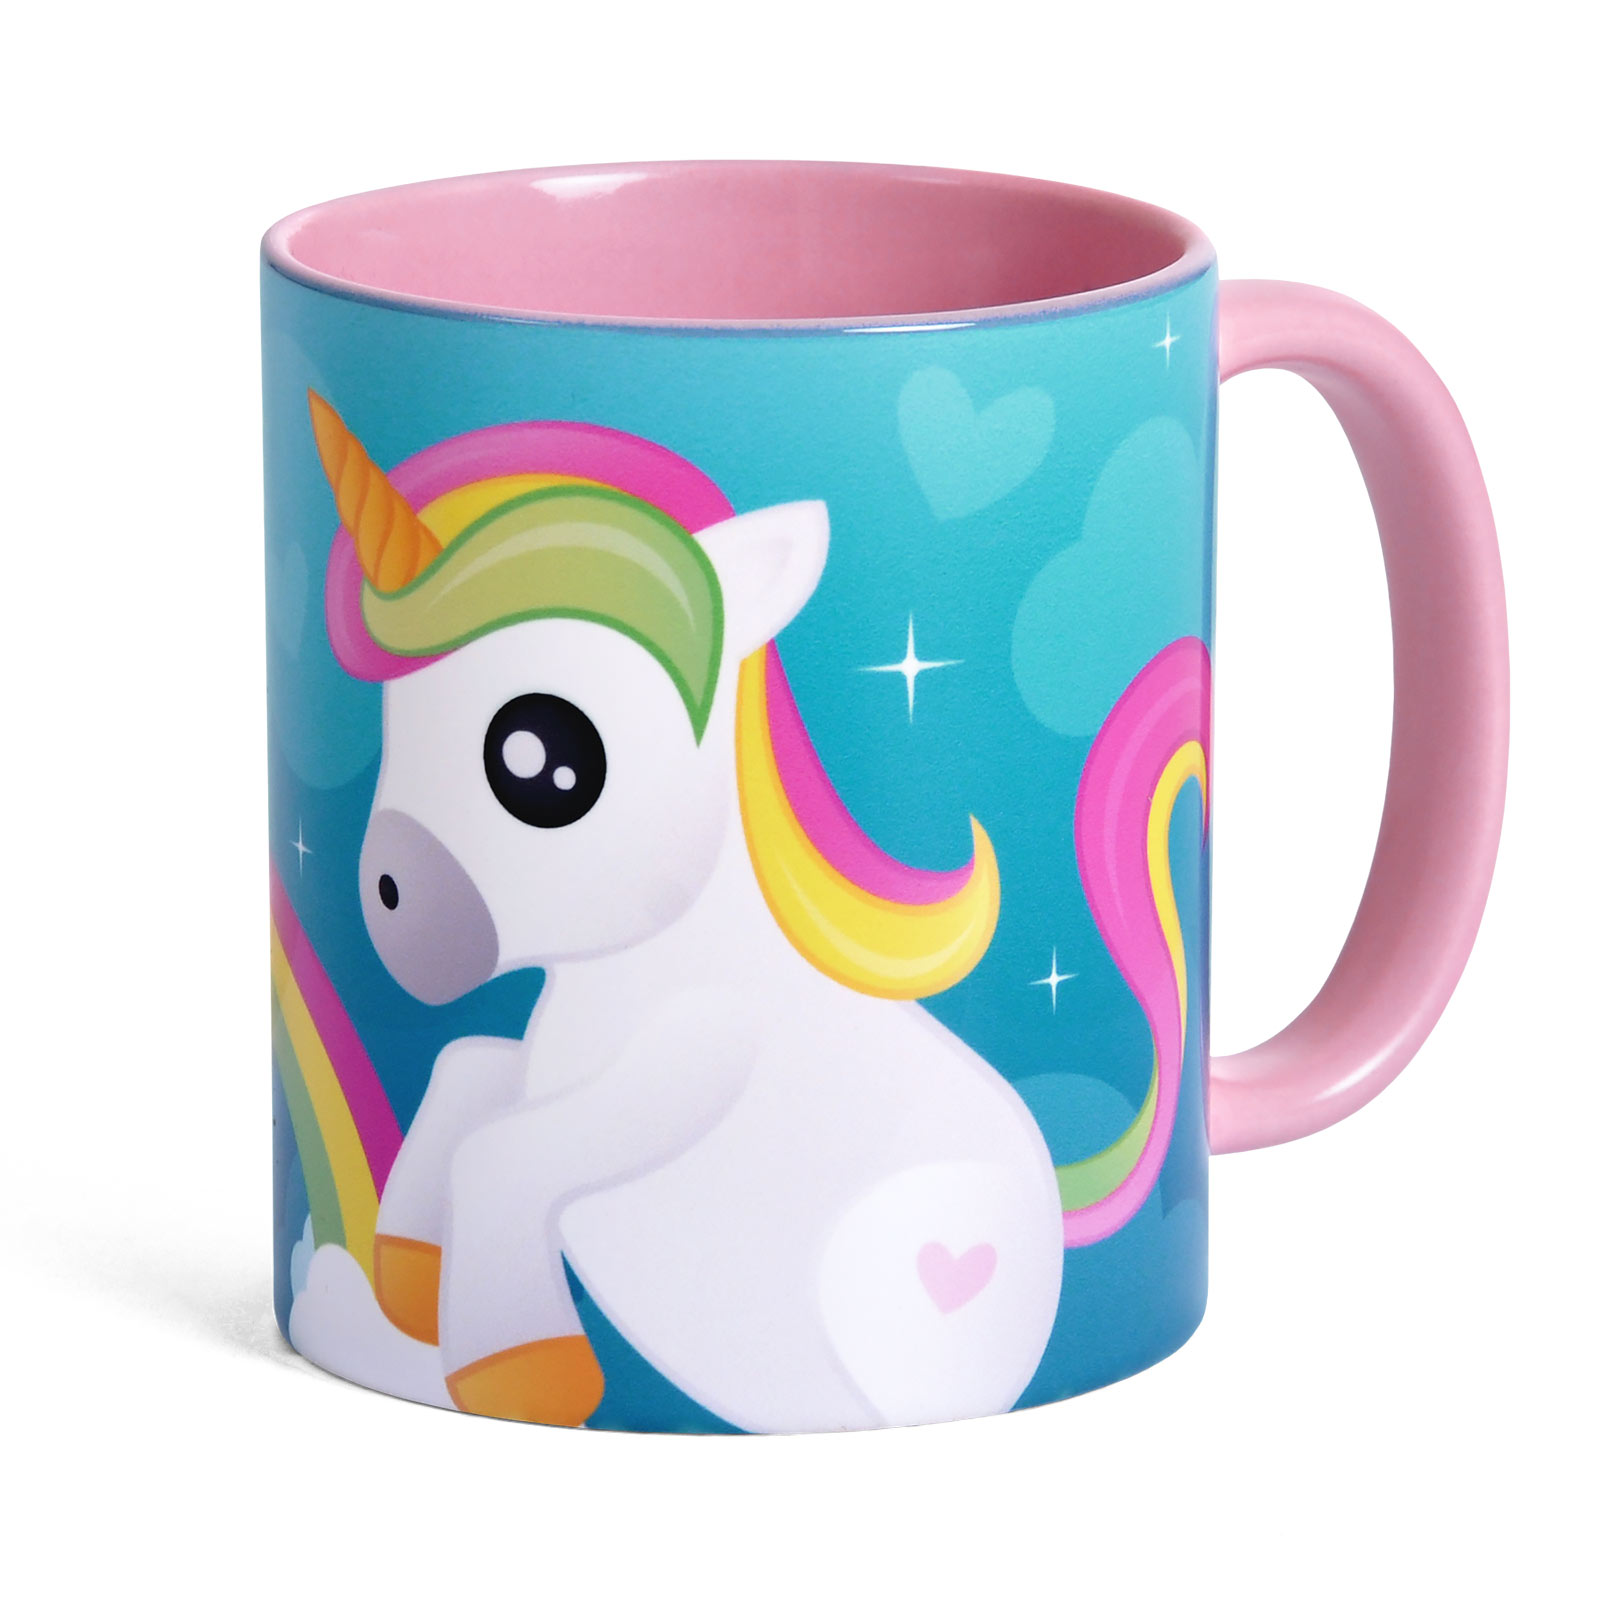 Fluffy Unicorn Tasse